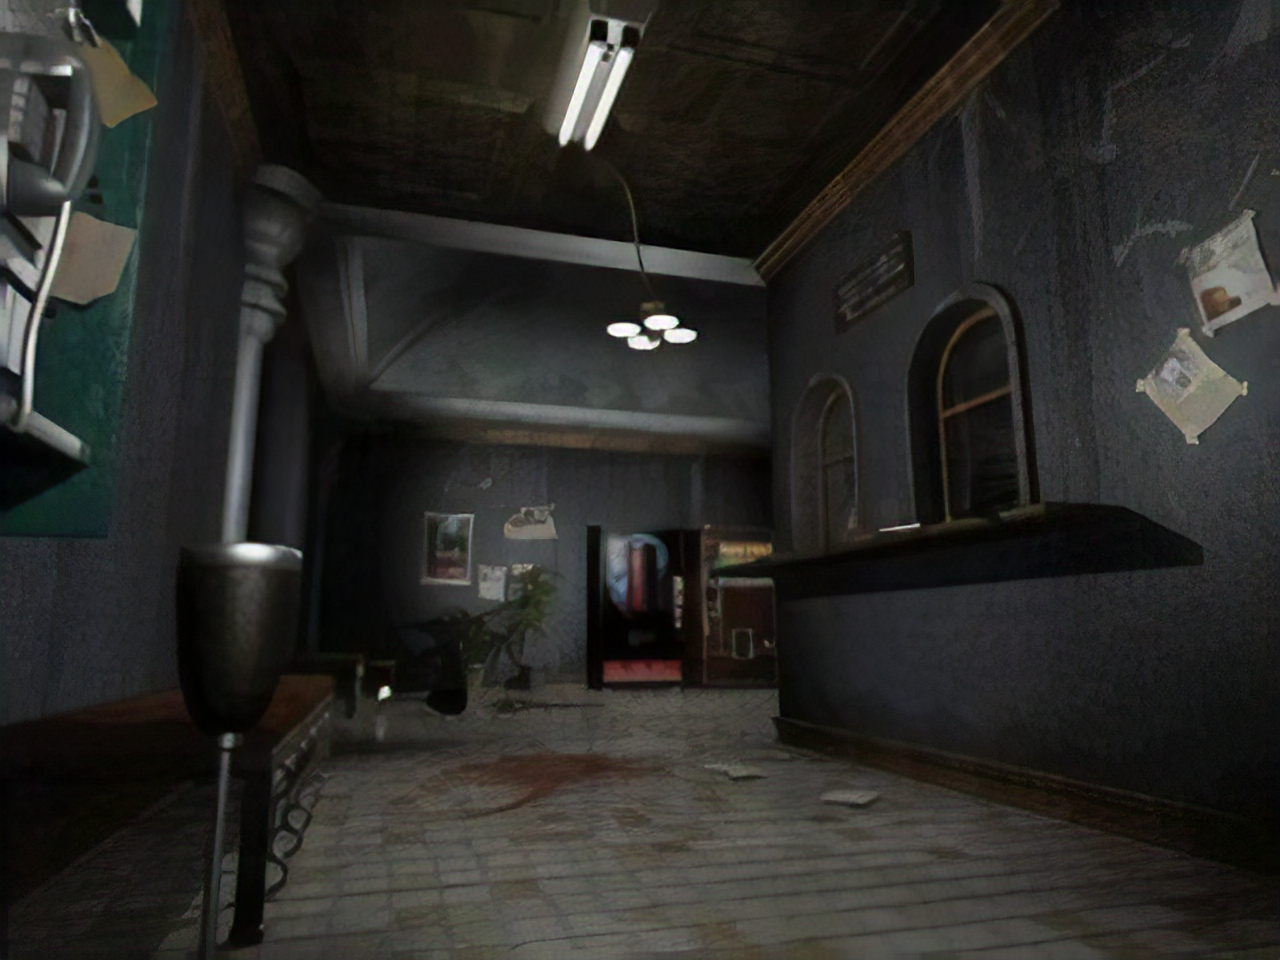 DF Retro: Resident Evil 2 - Classic Survival Horror - Every